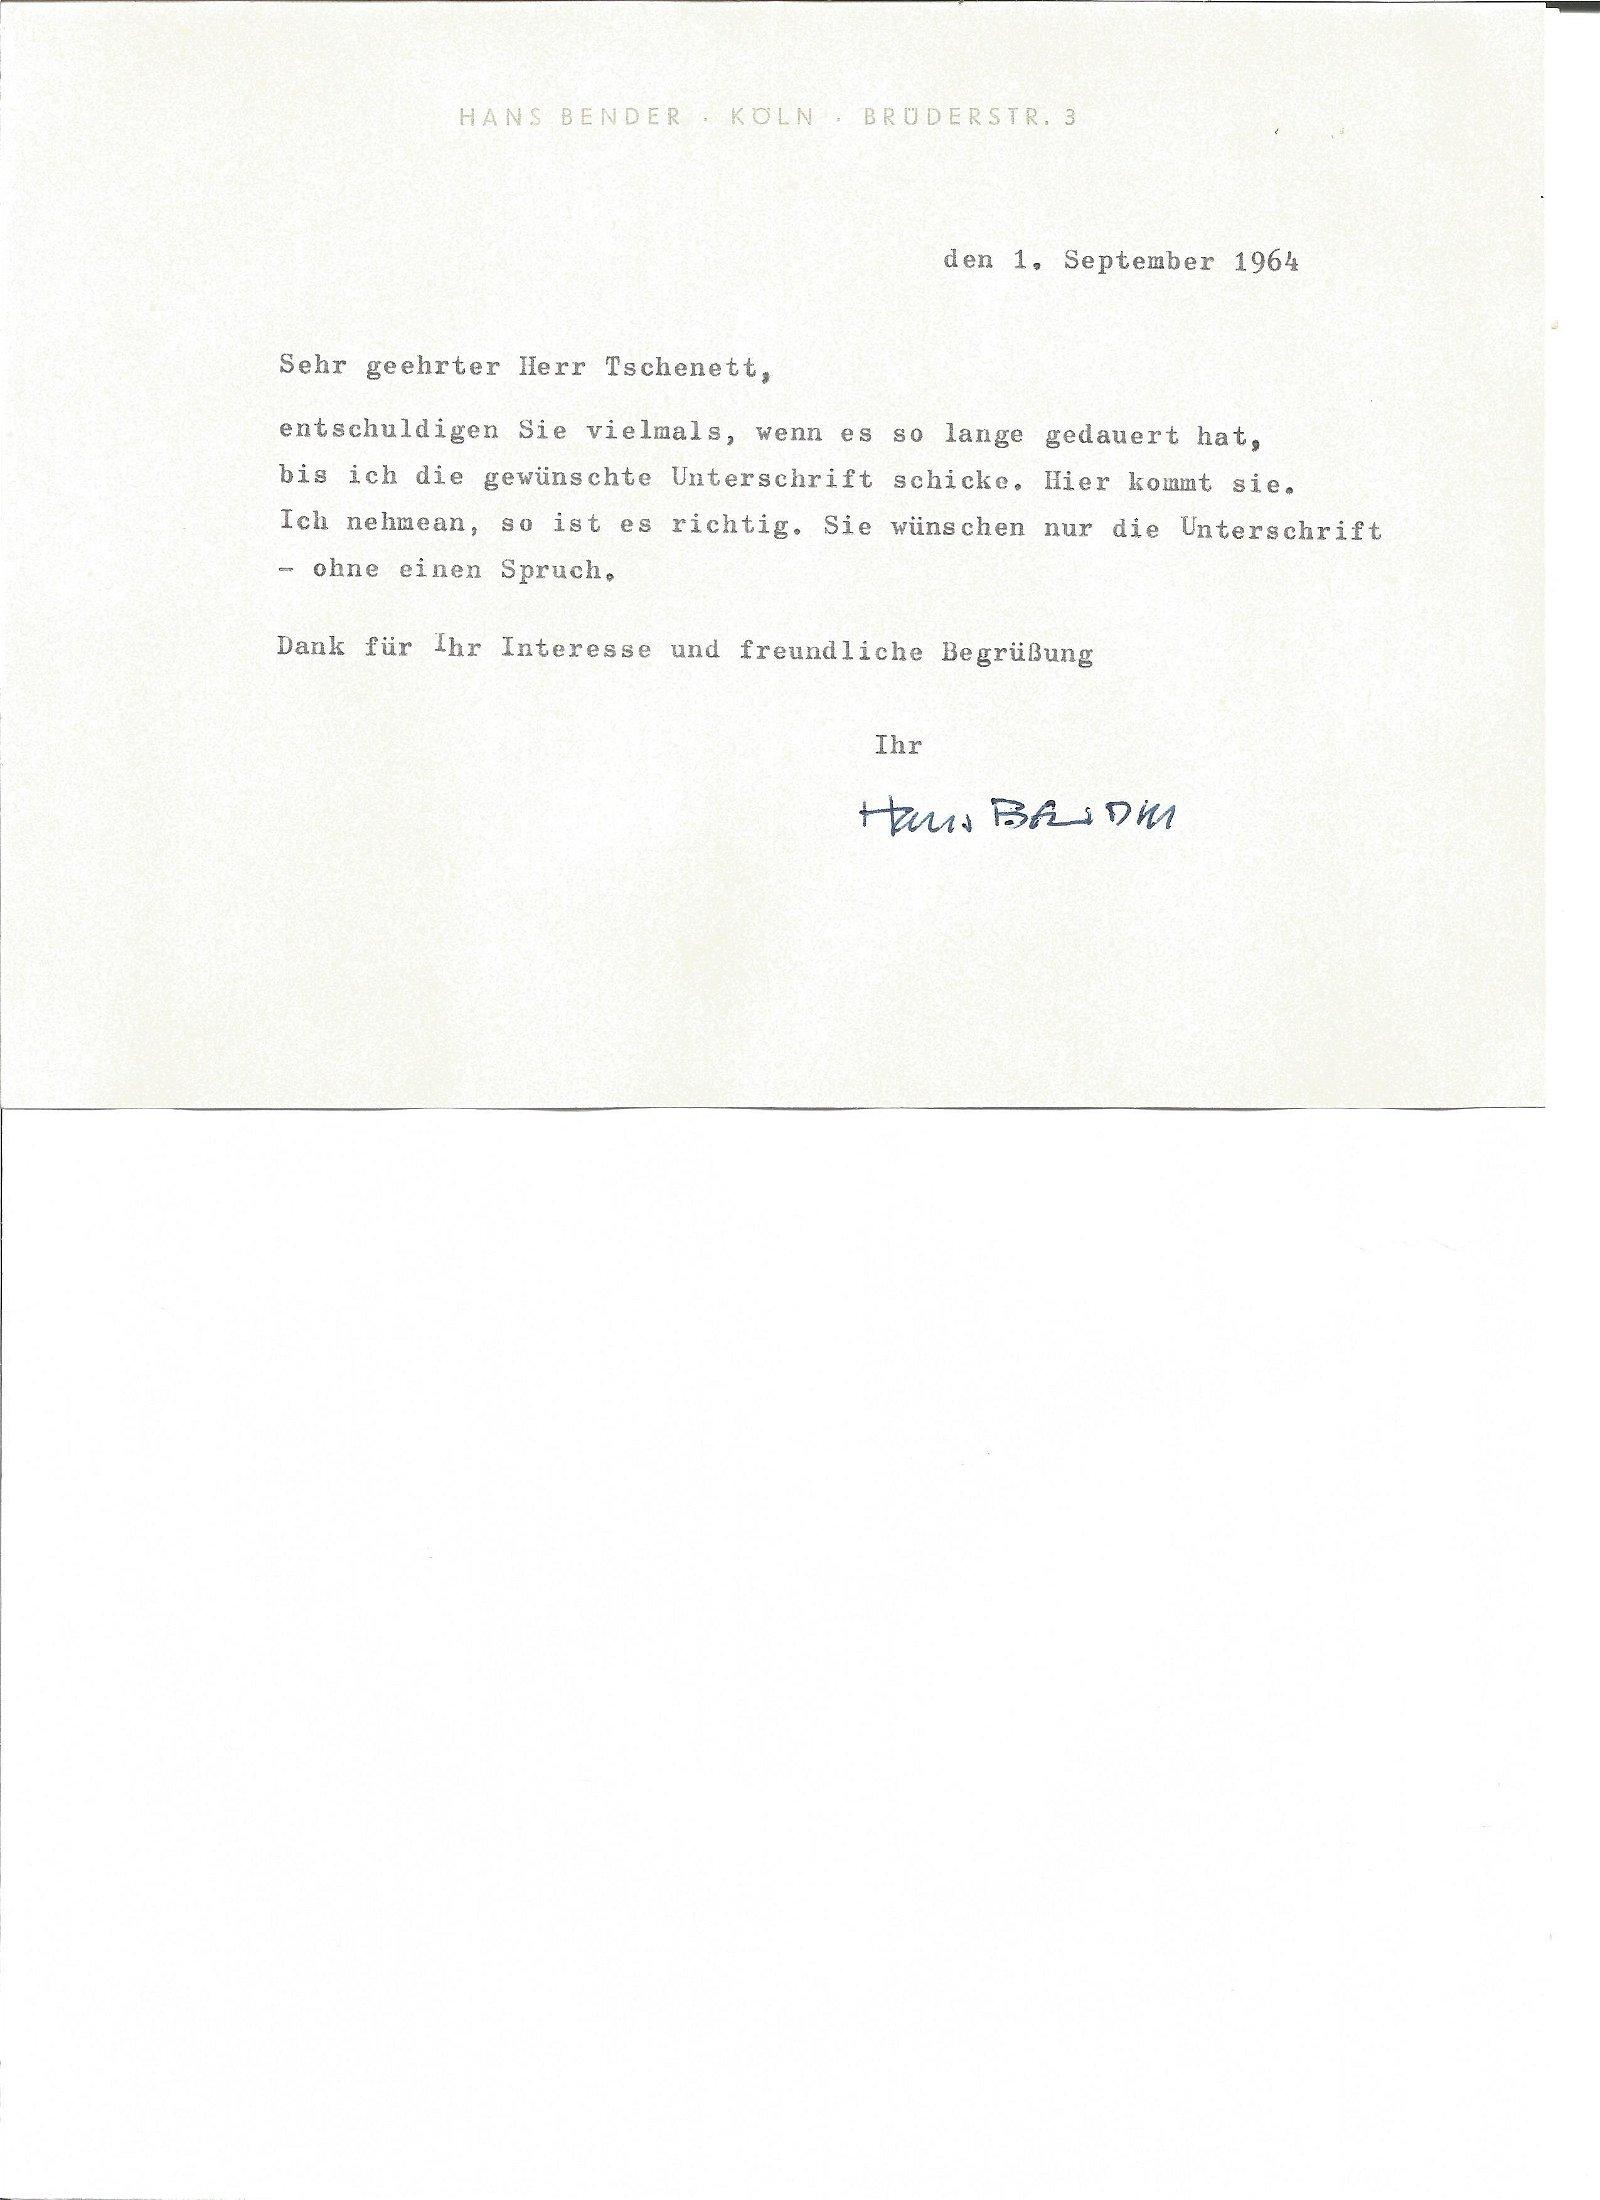 Hans Bender hand signed 1964 letter replying in German